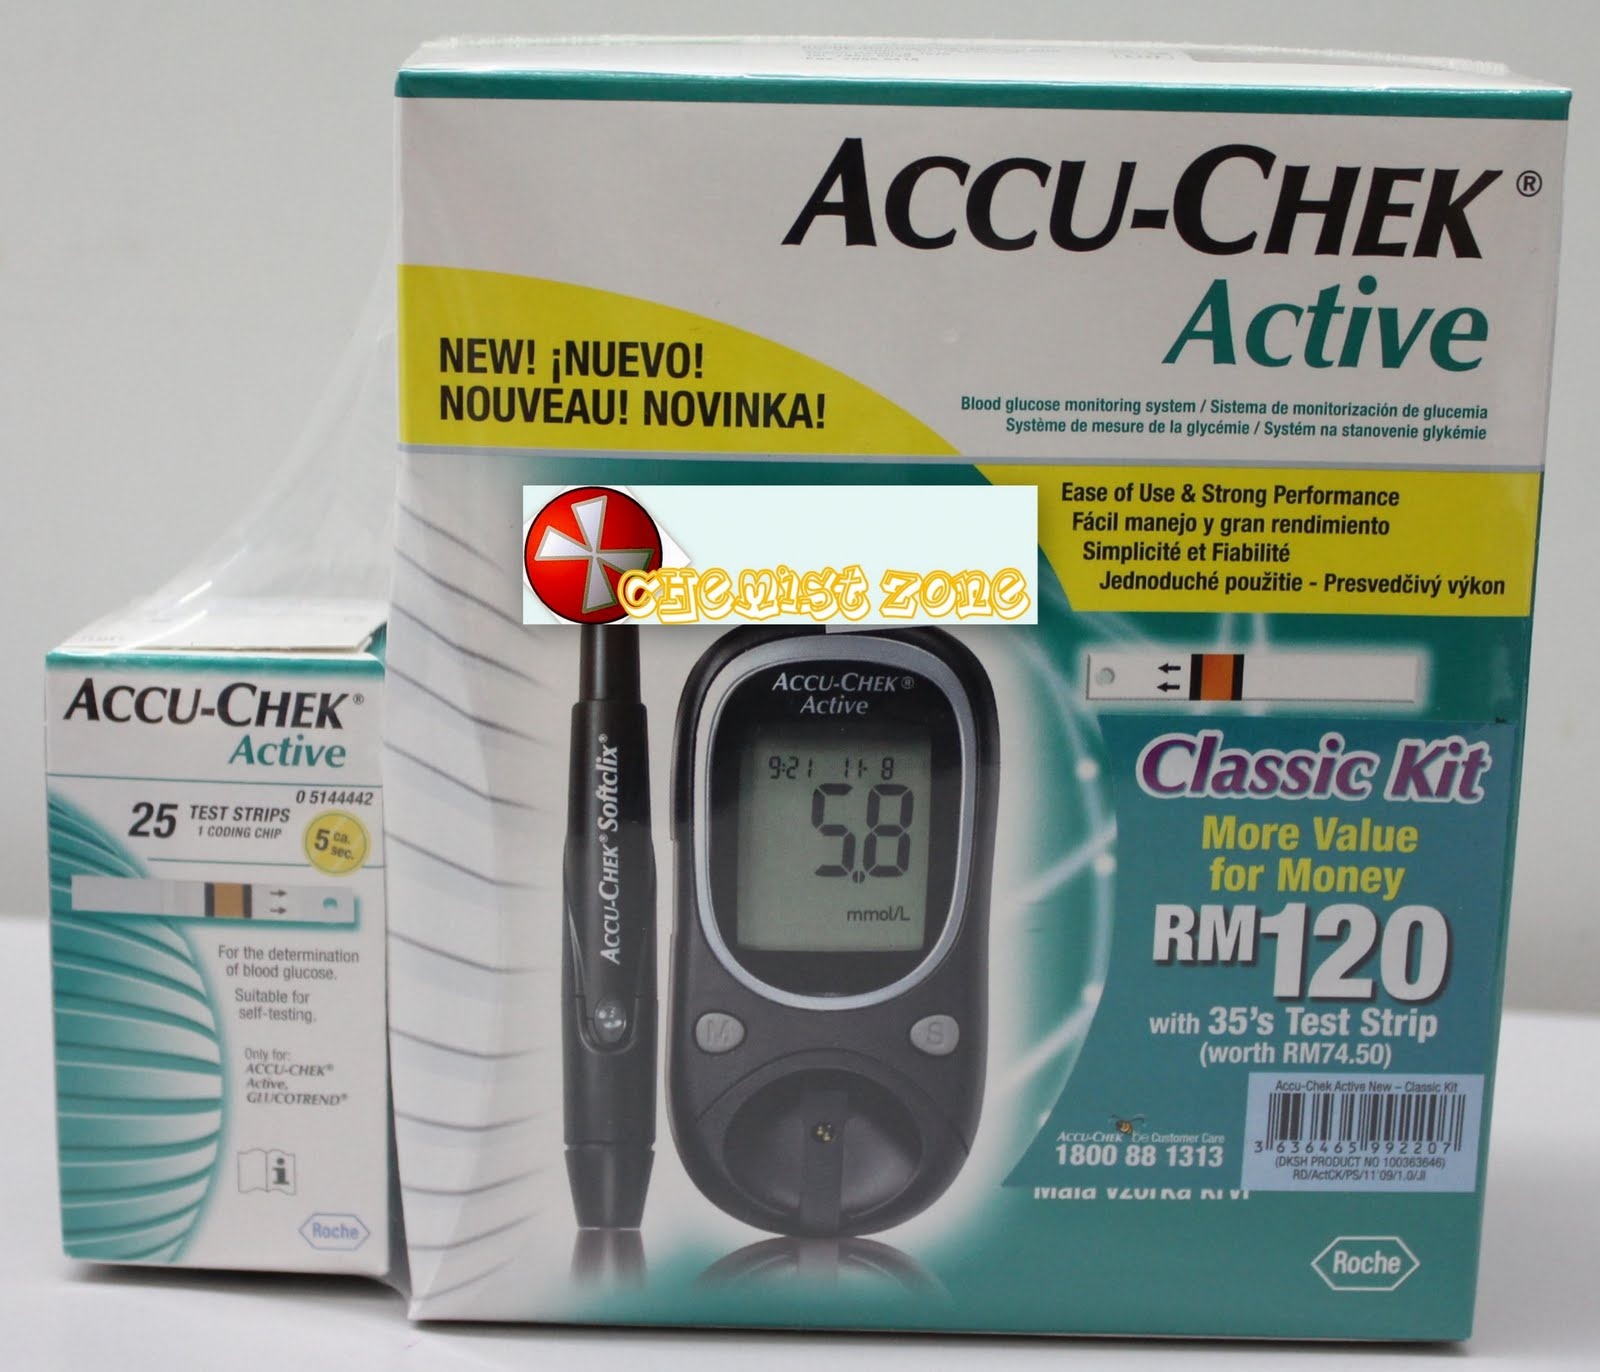 Chemist Zone Blood Glucose Monitoring